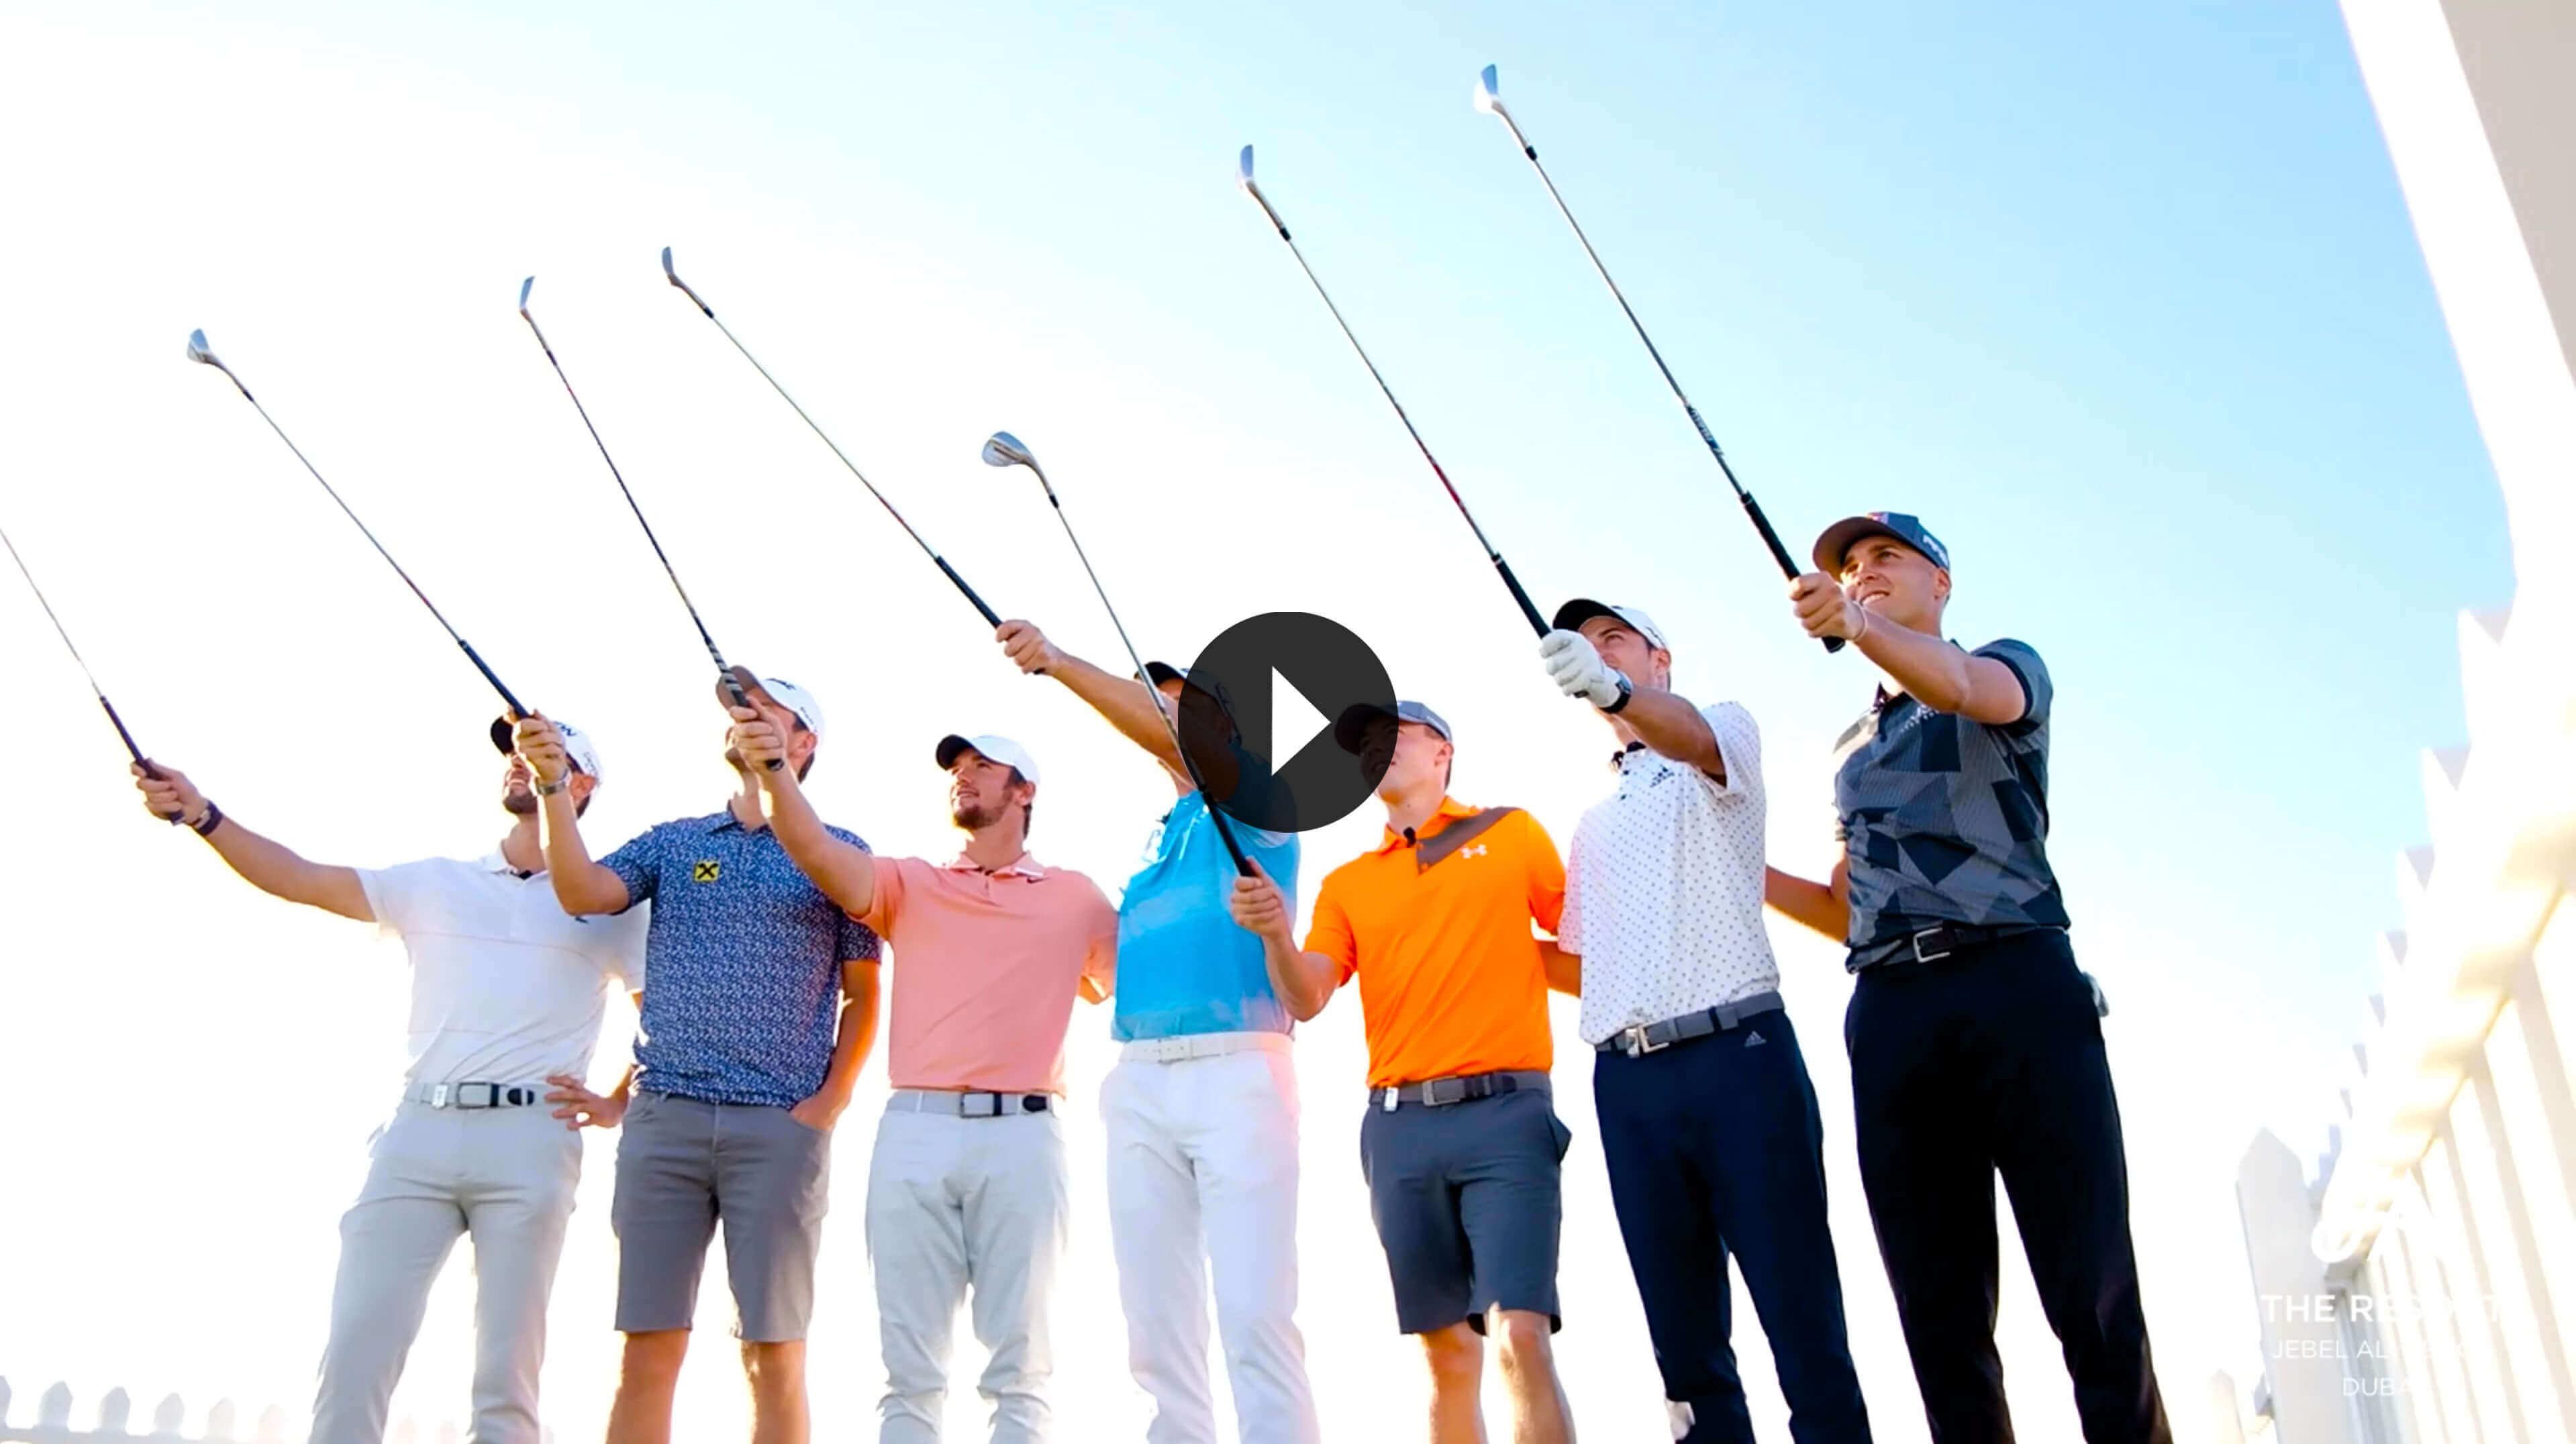 ja-the-resort-golf-video-thumbnail